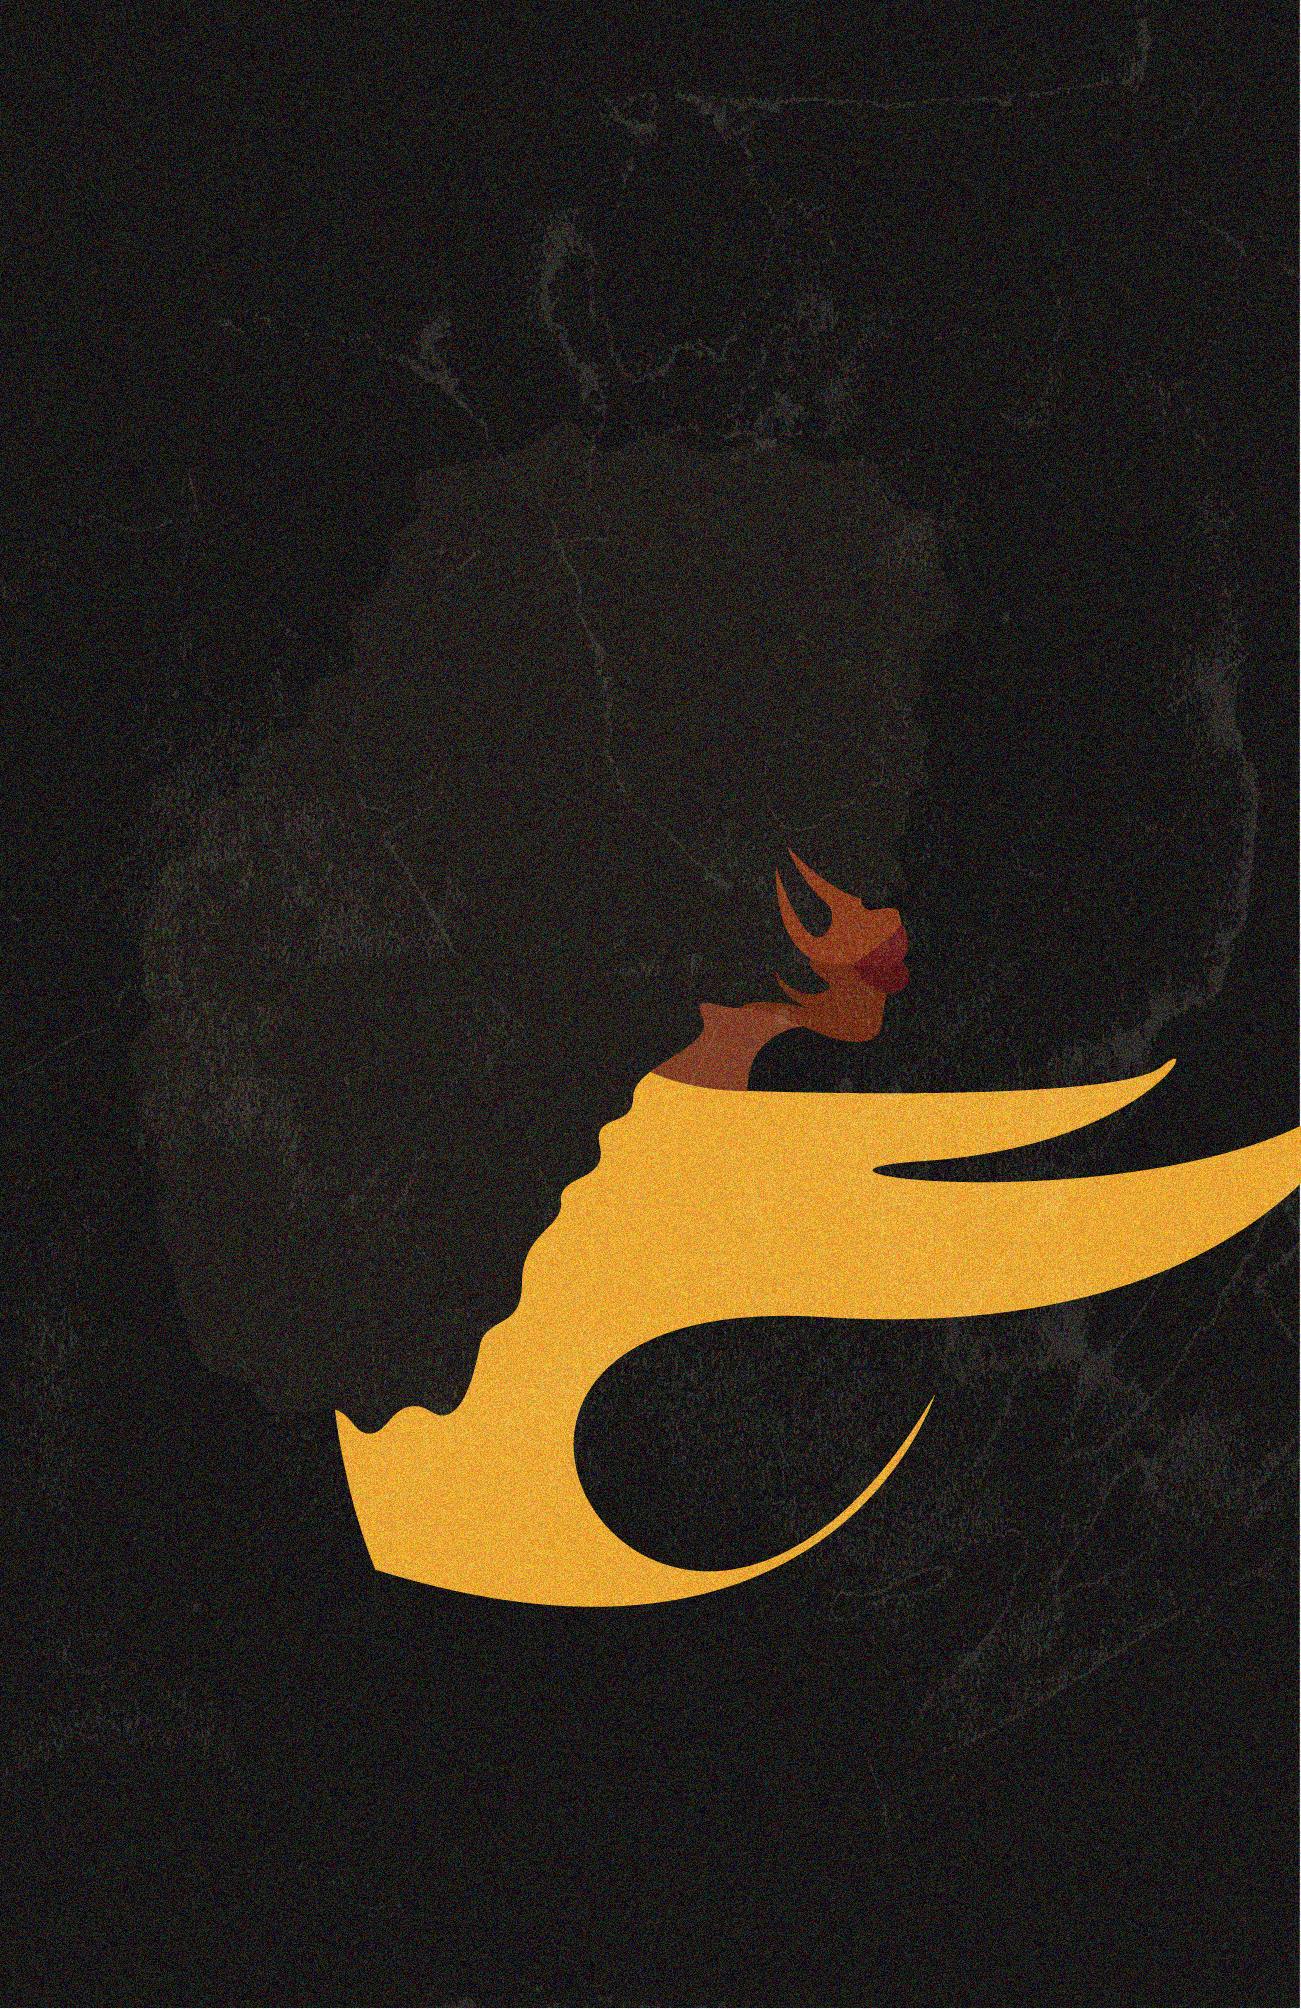 NAO  by Hamda Warsame (2018)